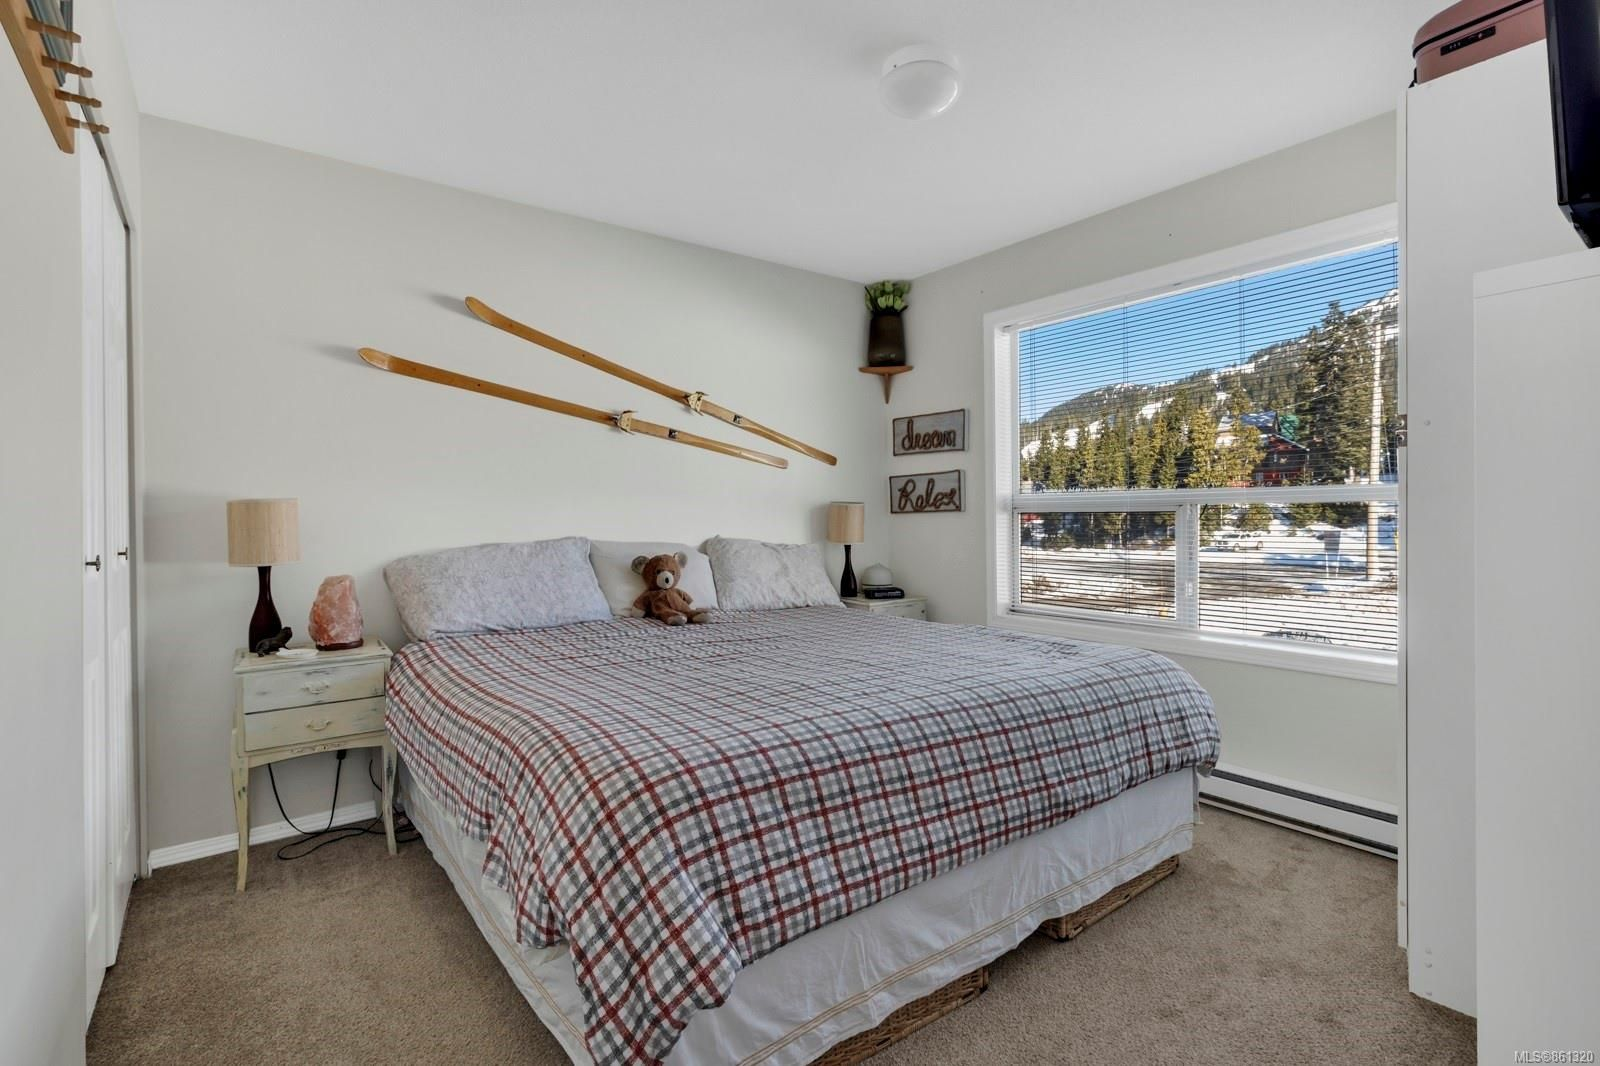 Main Photo: 207 1105 Henry Rd in : CV Mt Washington Condo for sale (Comox Valley)  : MLS®# 861320